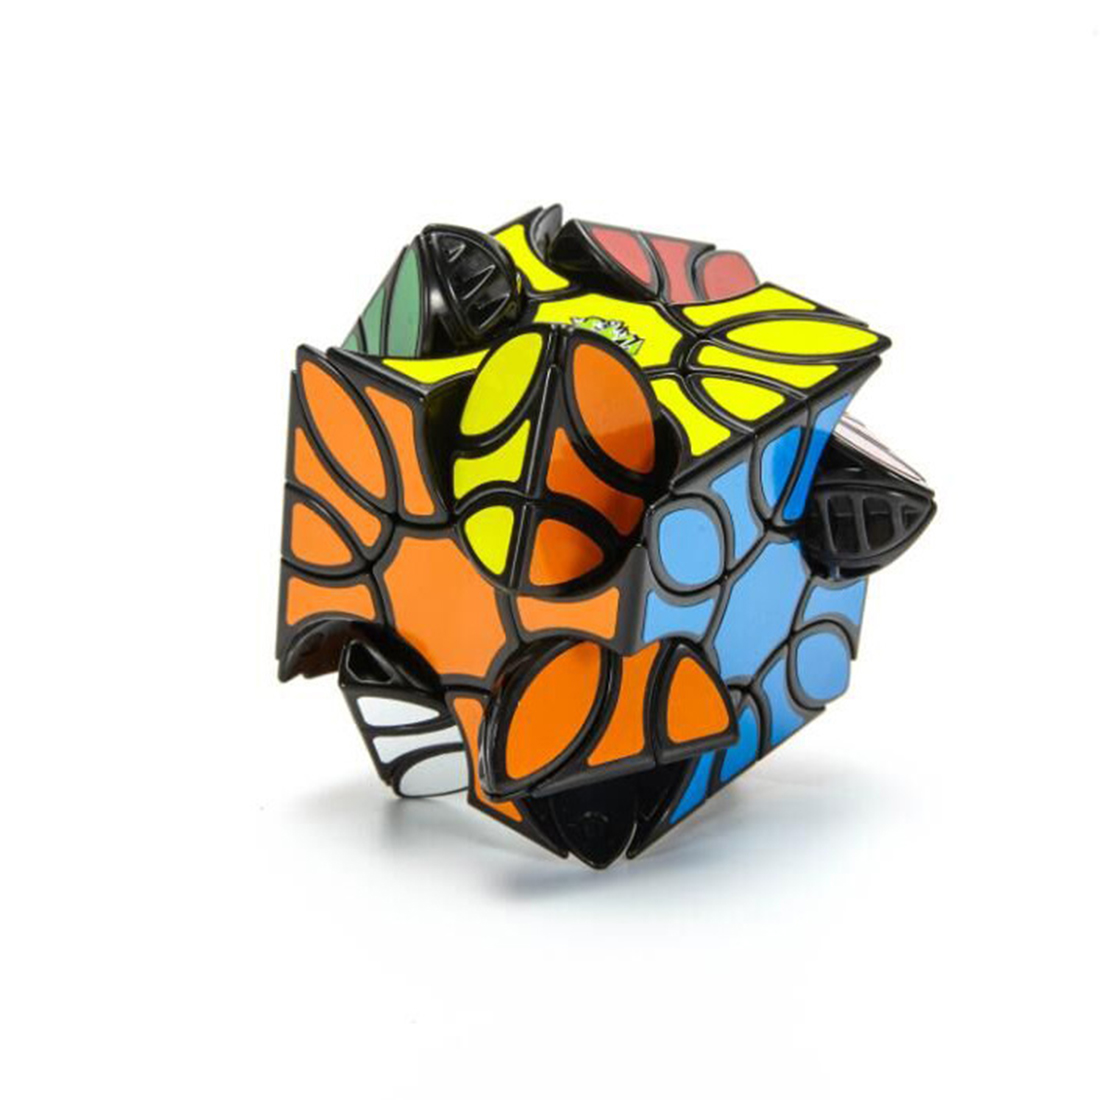 Lanlan Sunflower Cube 2